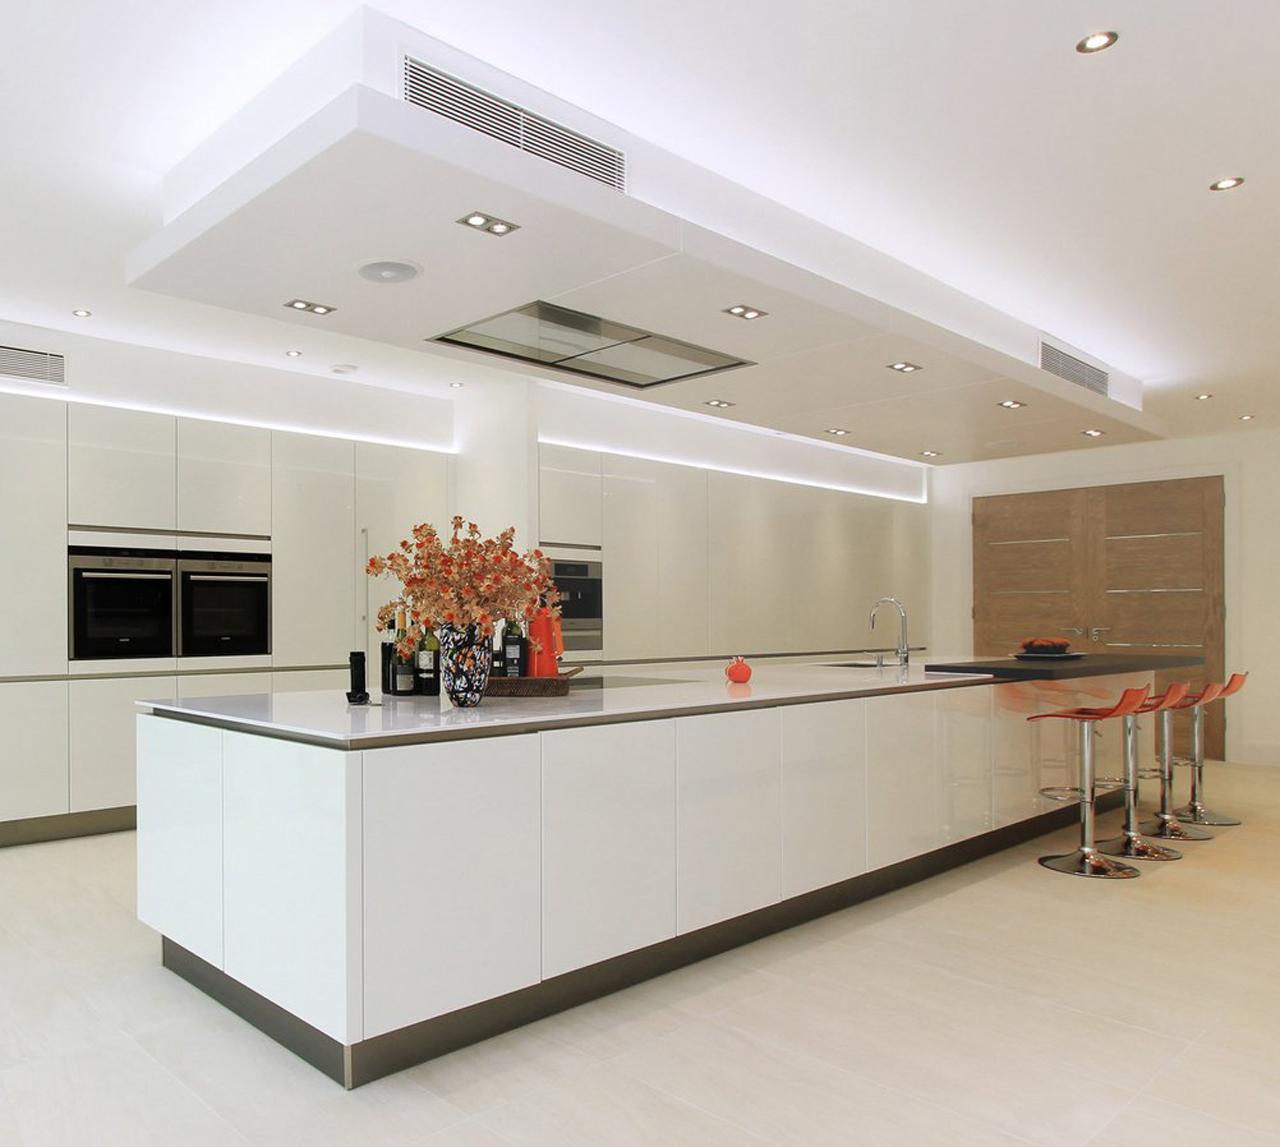 New Modern Kitchens At Neil Lerner: Large Fitted Kitchen Designs